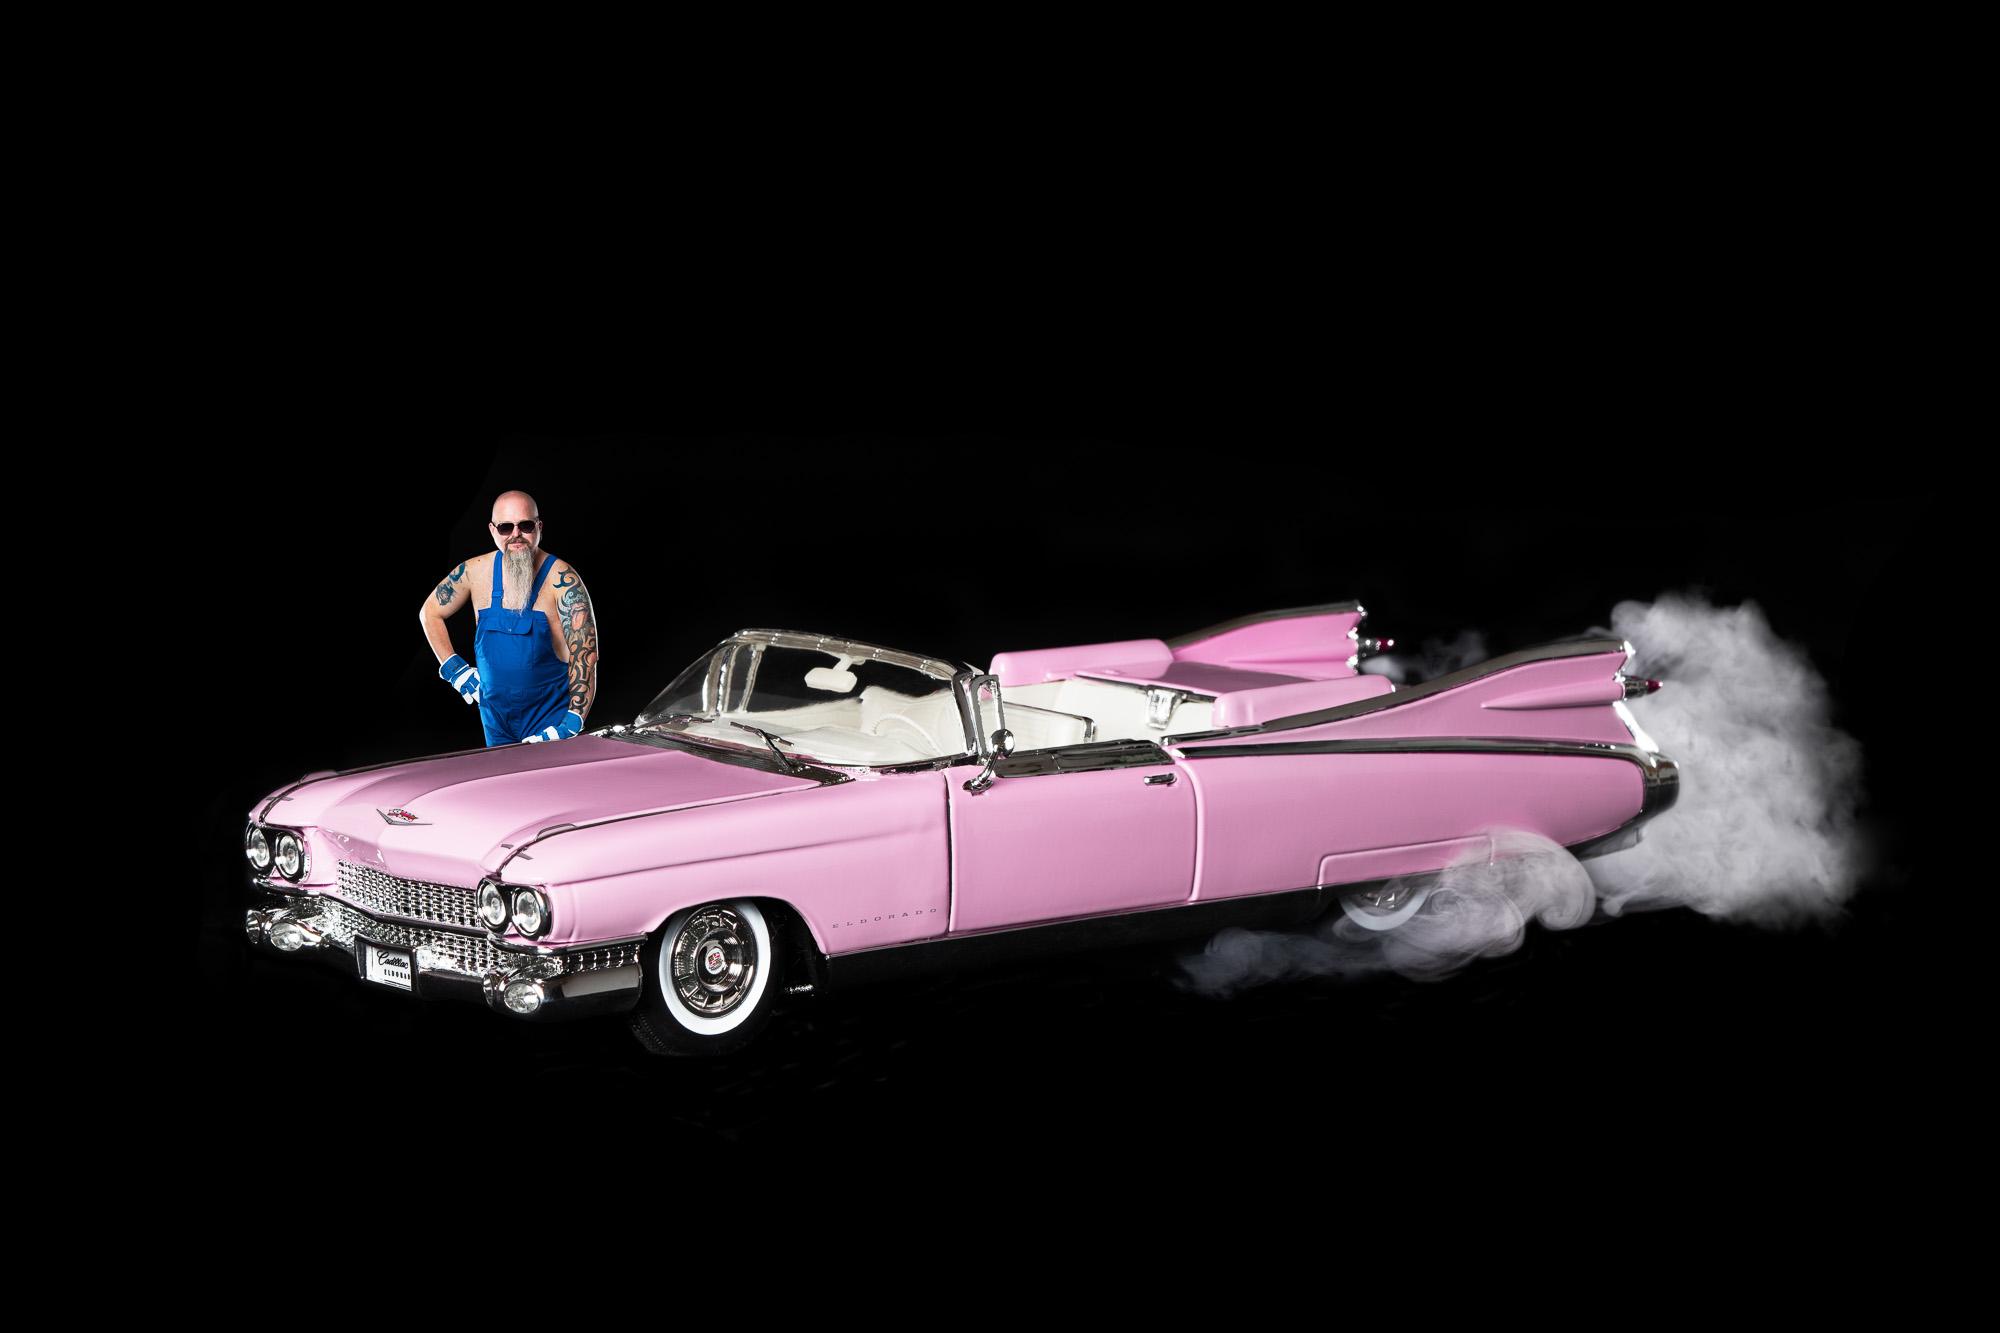 Pink Cadillac (Nathalie Cole, 1987)